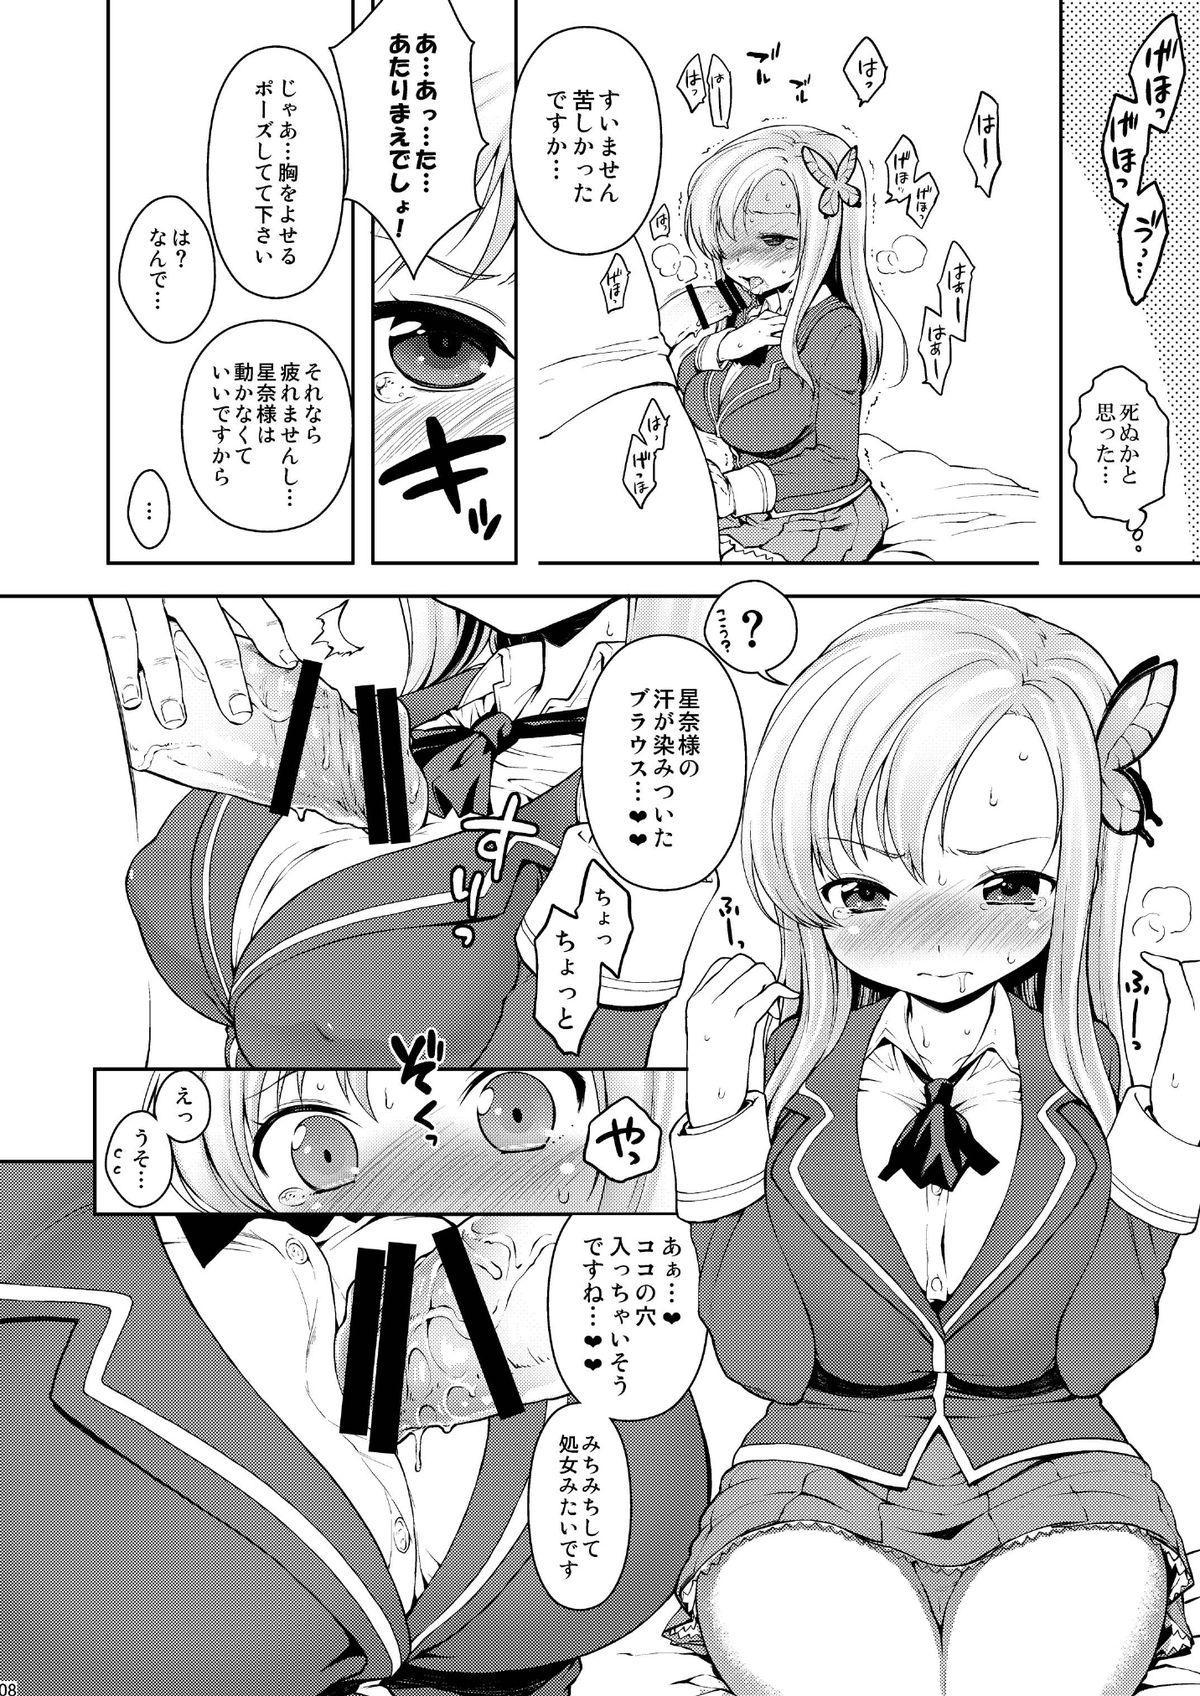 Sena-sama Fuhihi 7